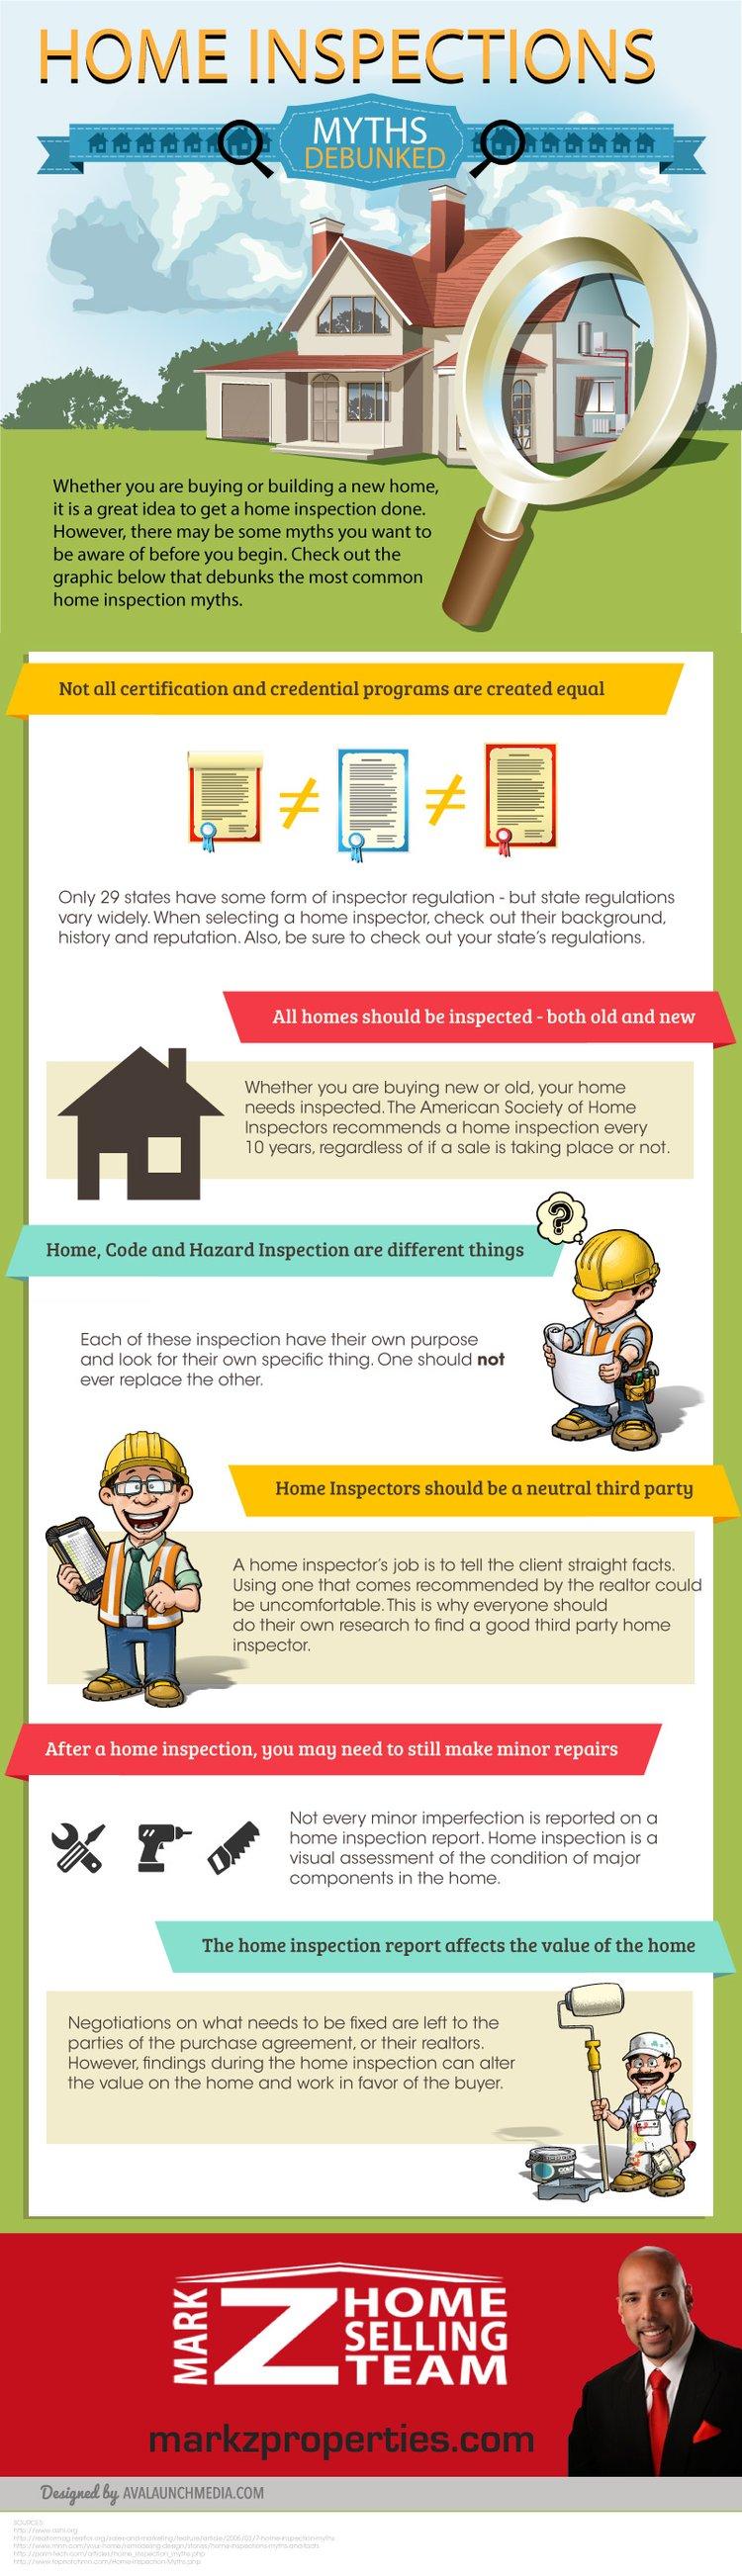 home_inspection_myths_2779